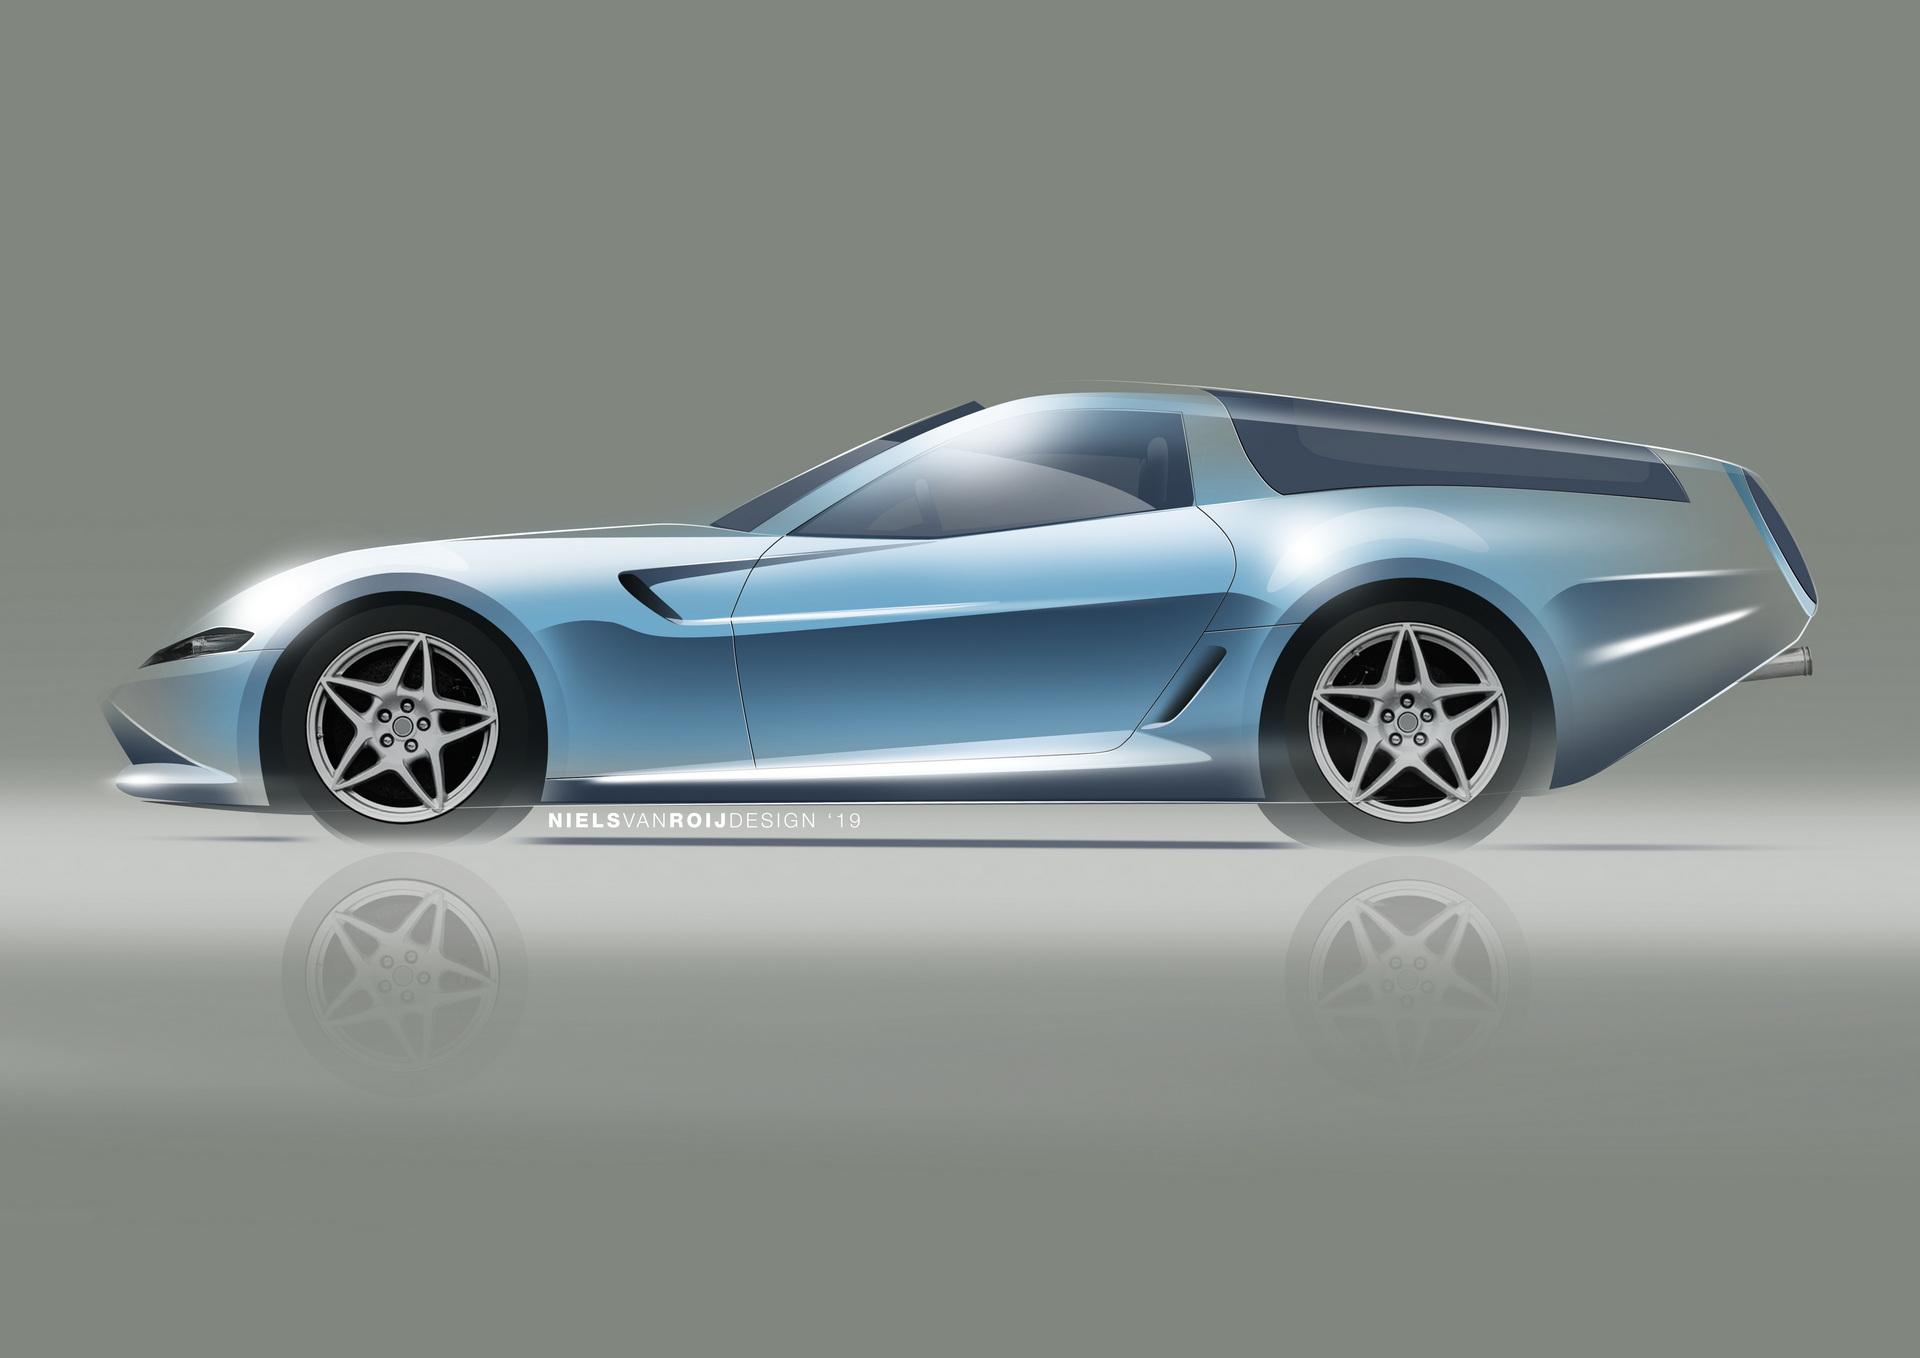 Ferrari-Daytona-Shooting-Brake-Hommage-by-Niels-van-Roij-Design-24